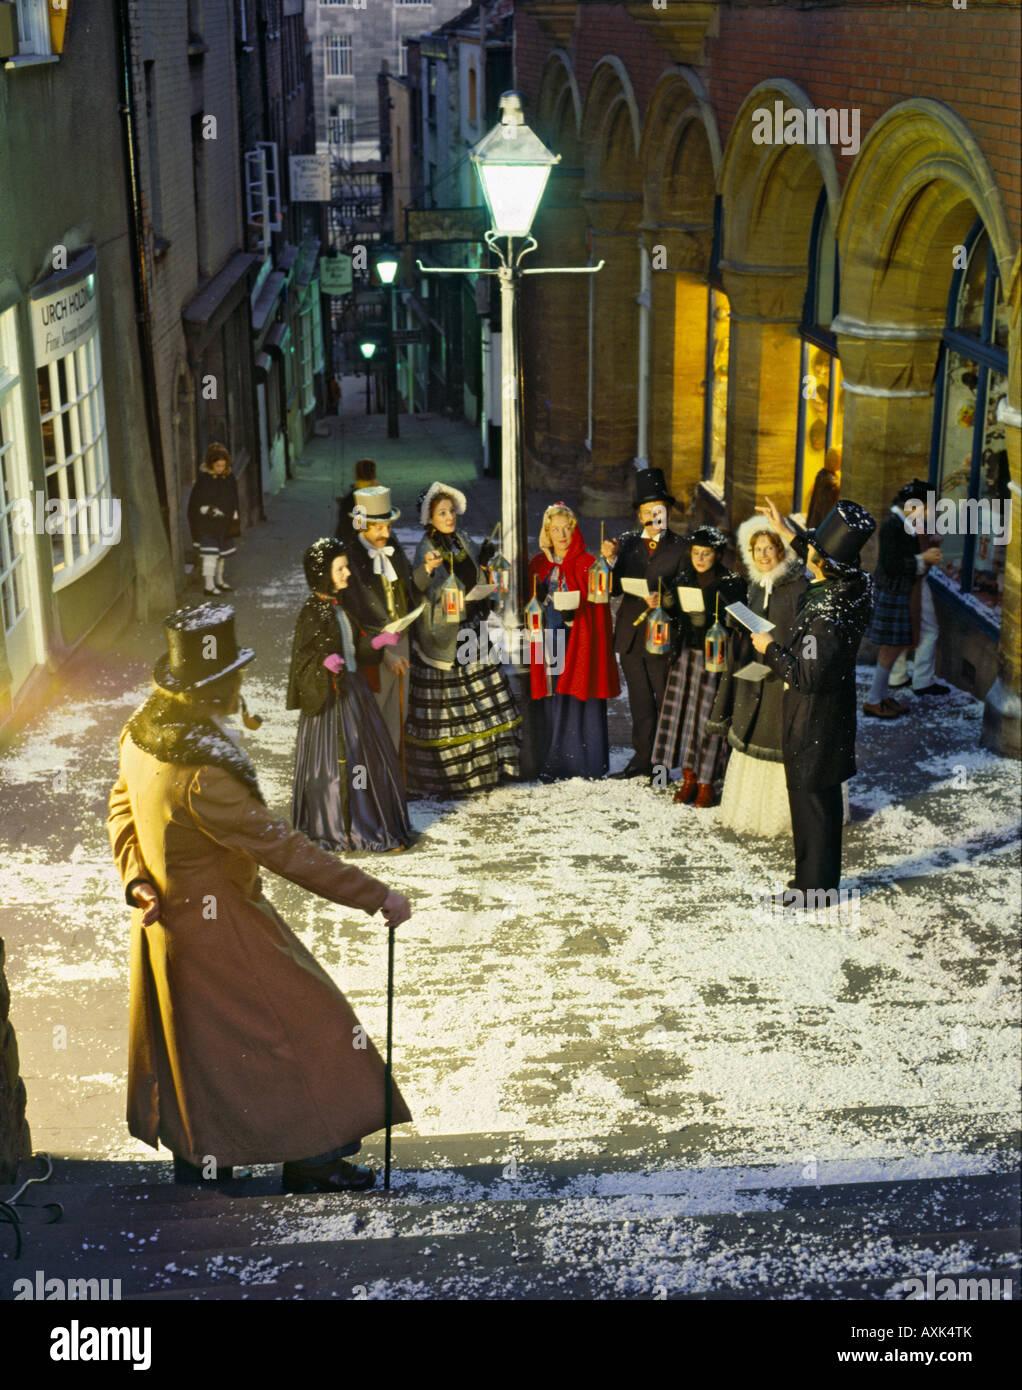 Old Fashioned English Christmas Image